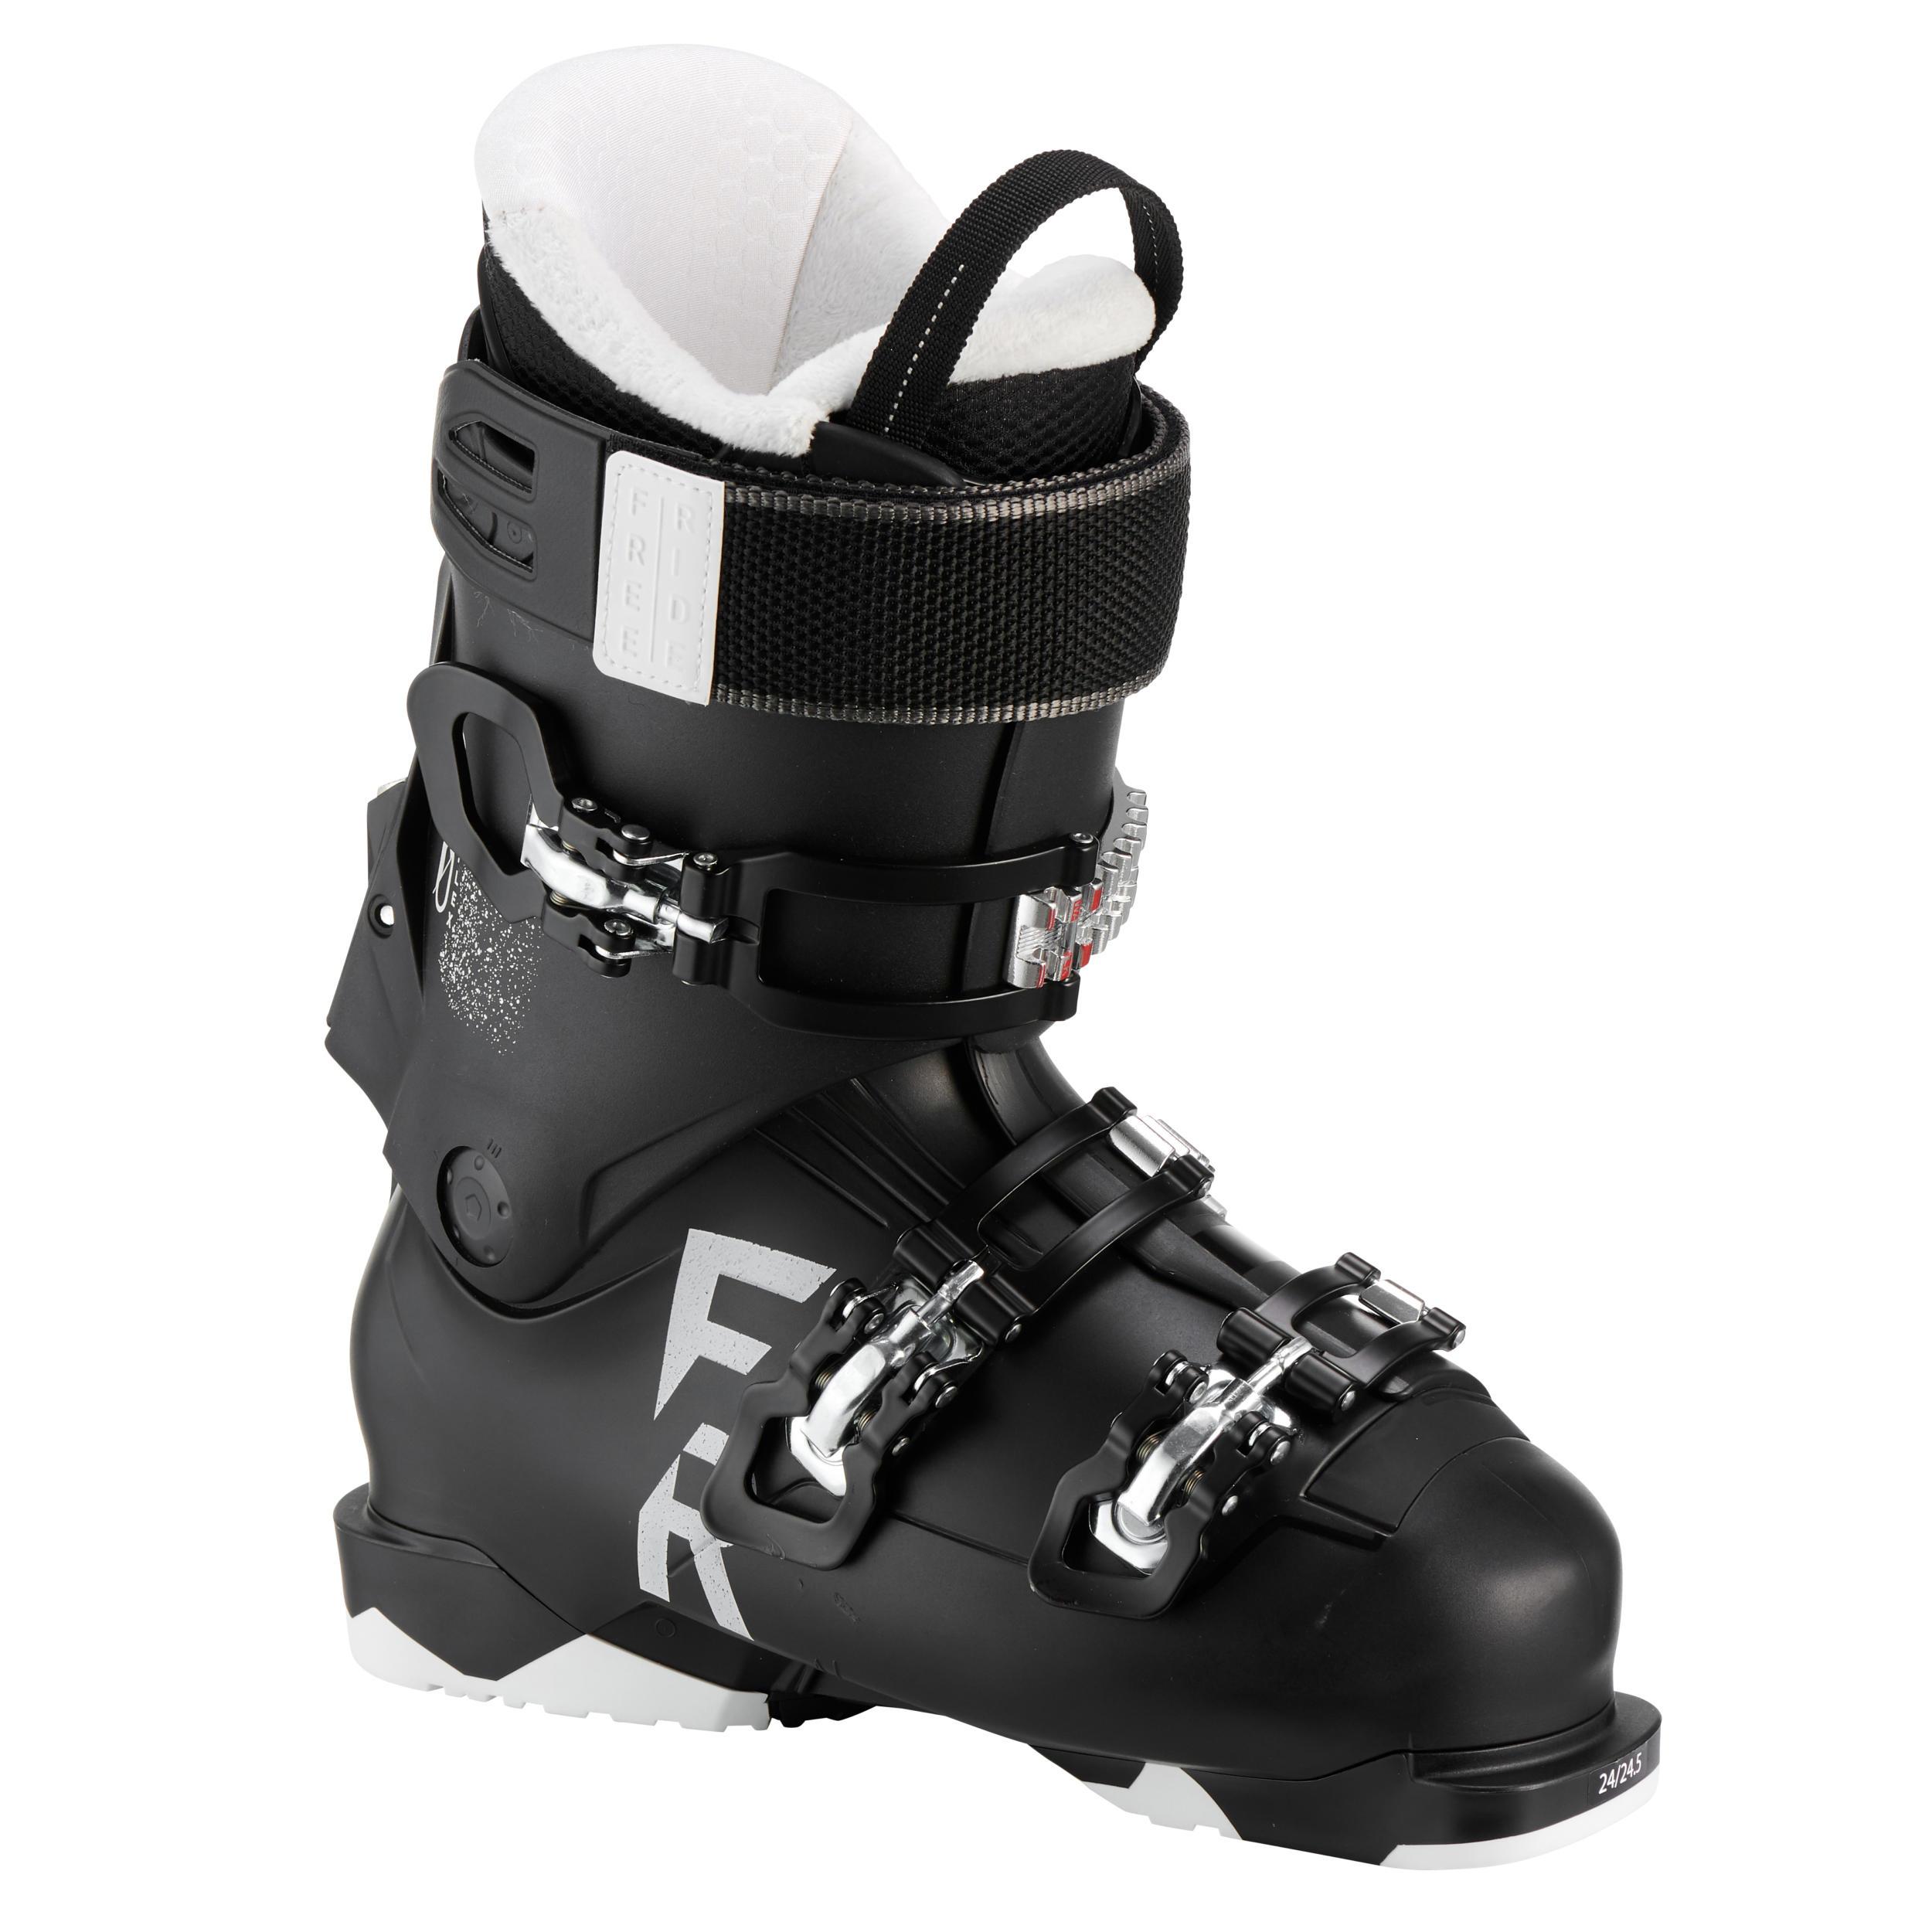 Clăpari schi FR 100 FLEX 80